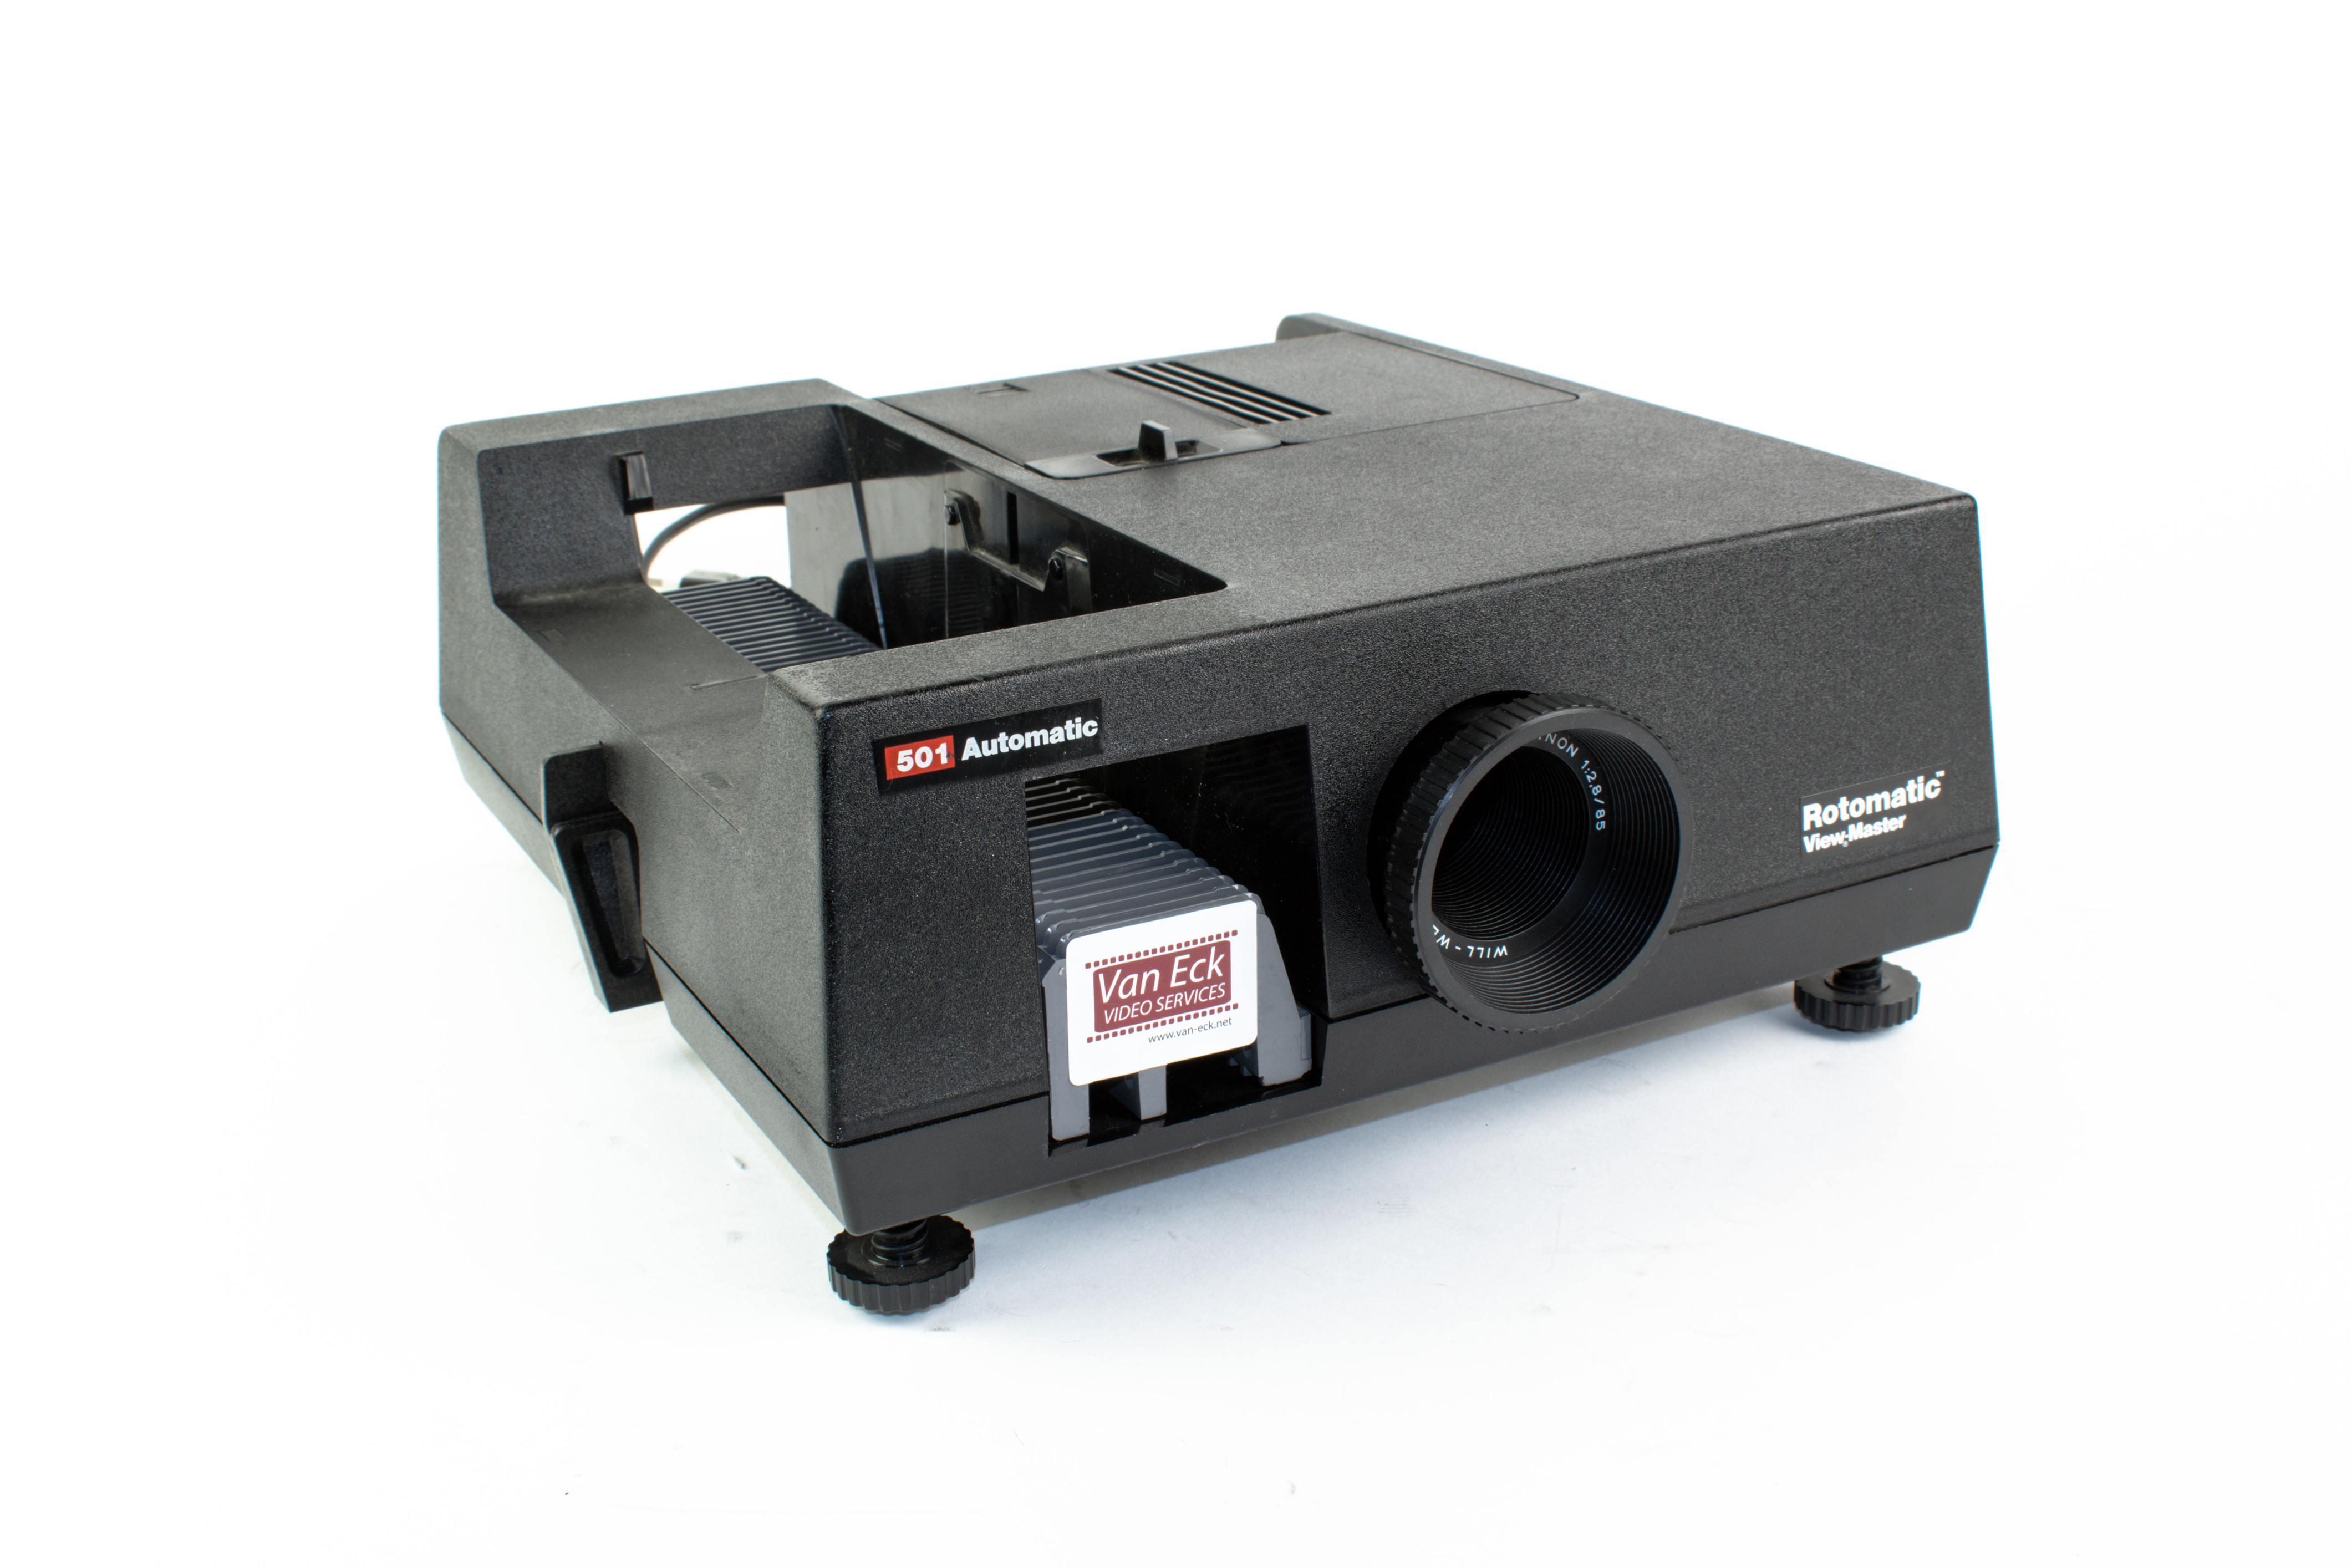 Rotomatic 501 Automatic